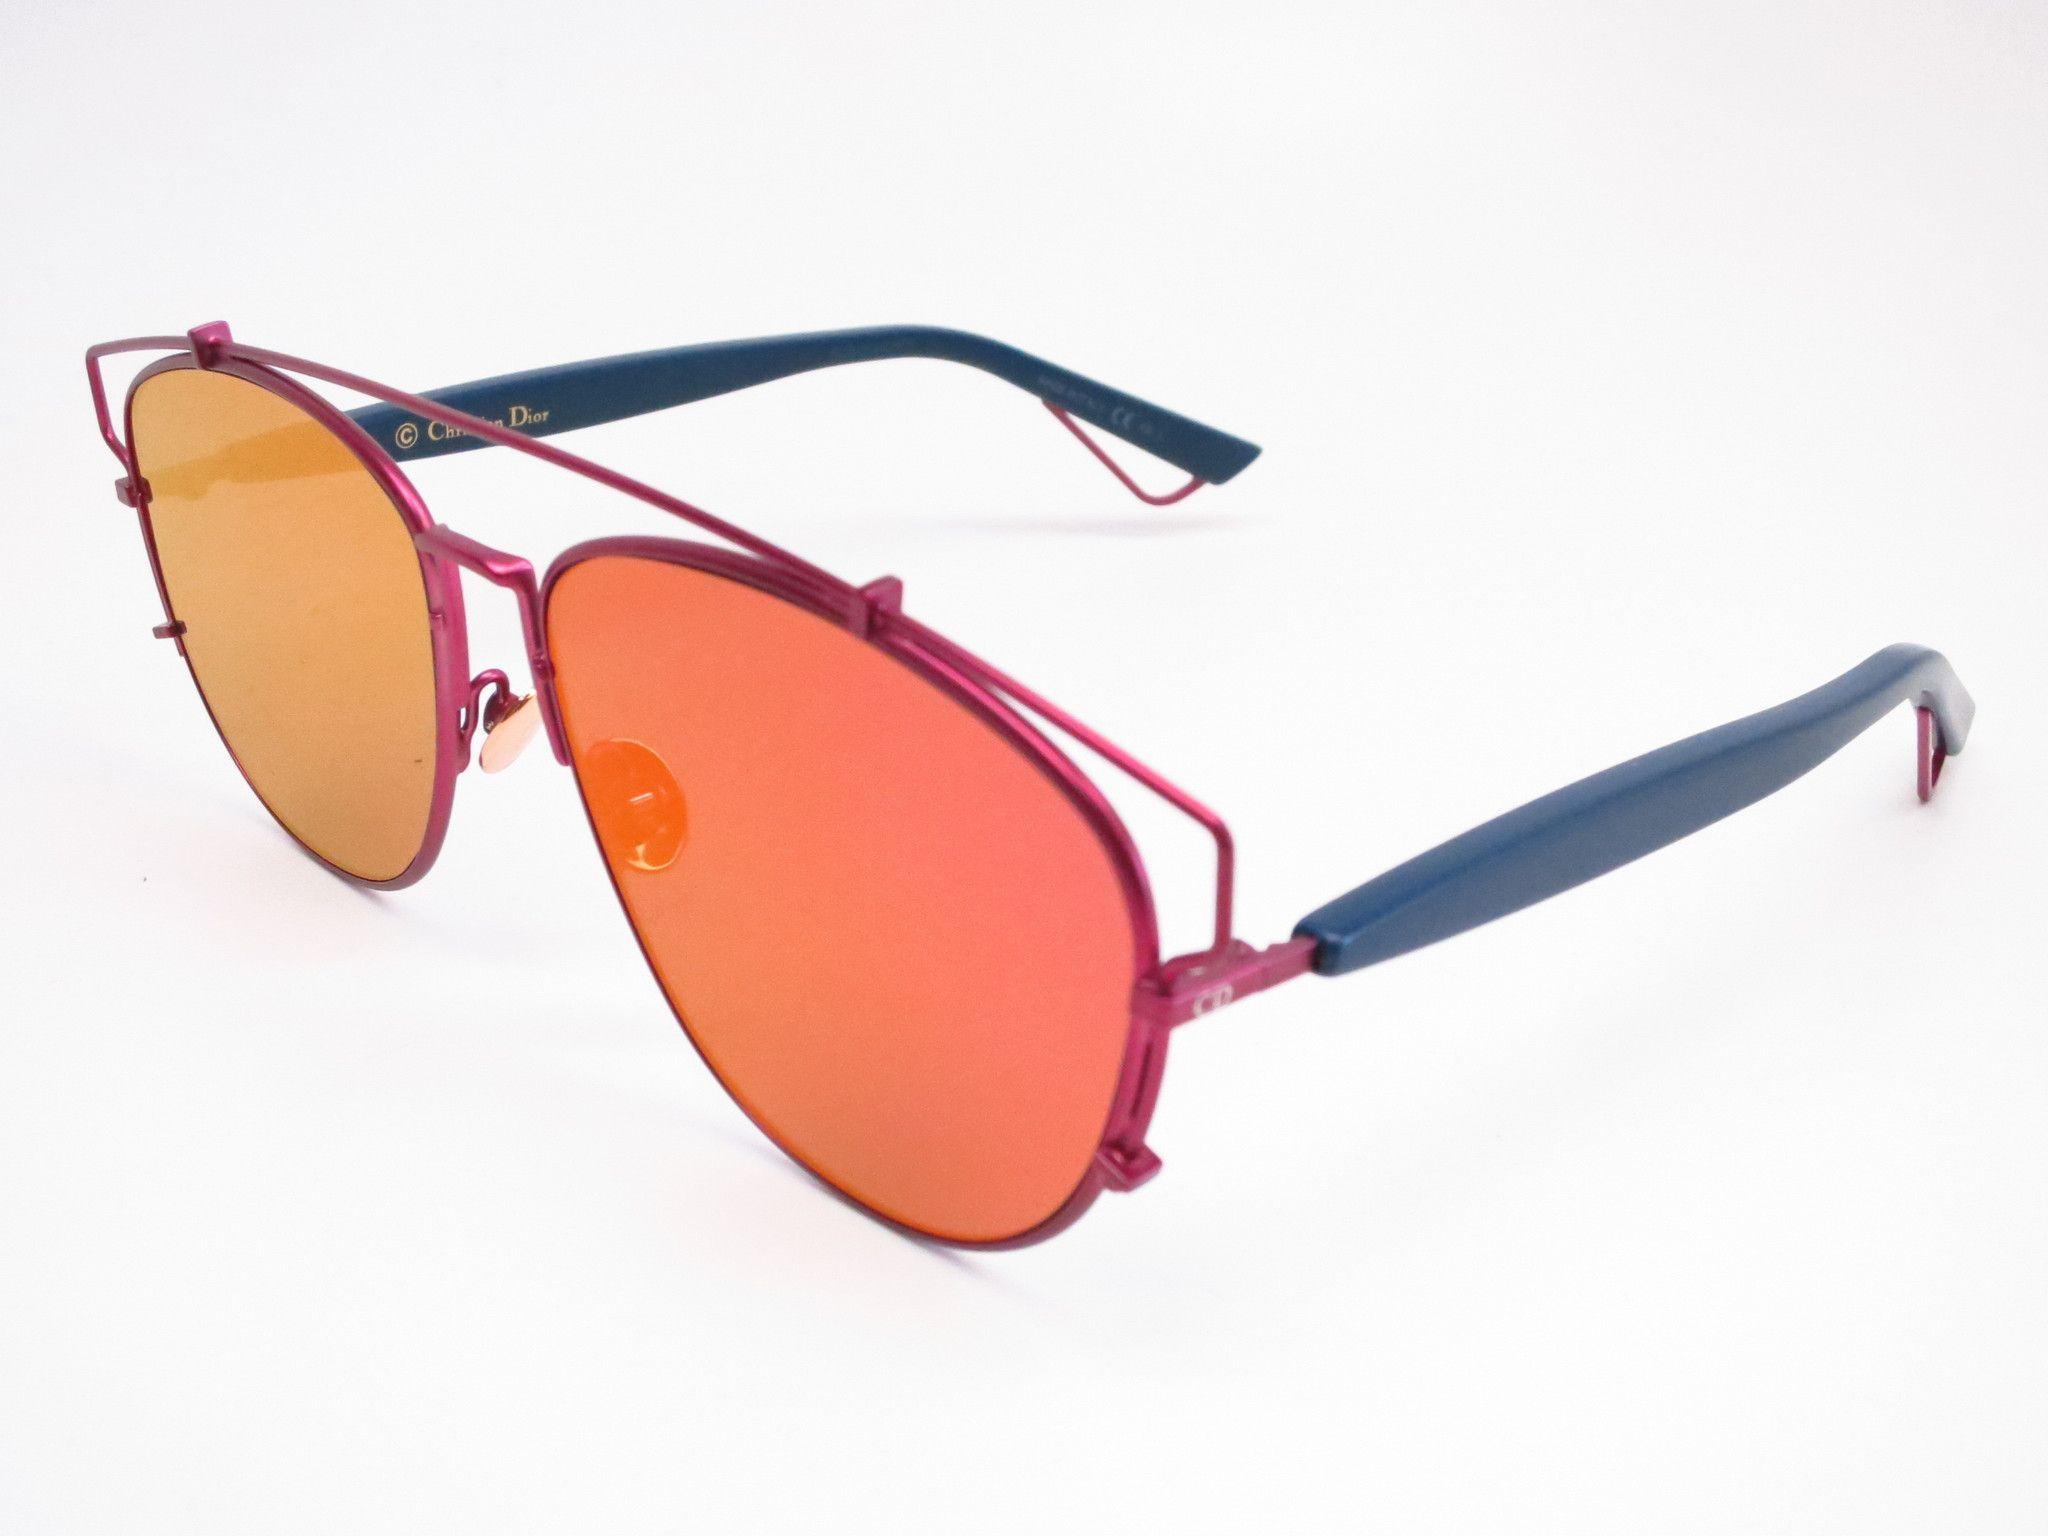 17c6b5c1588 Dior Technologic Sunglasses Product Details Brand   Christion Dior Model  Name…